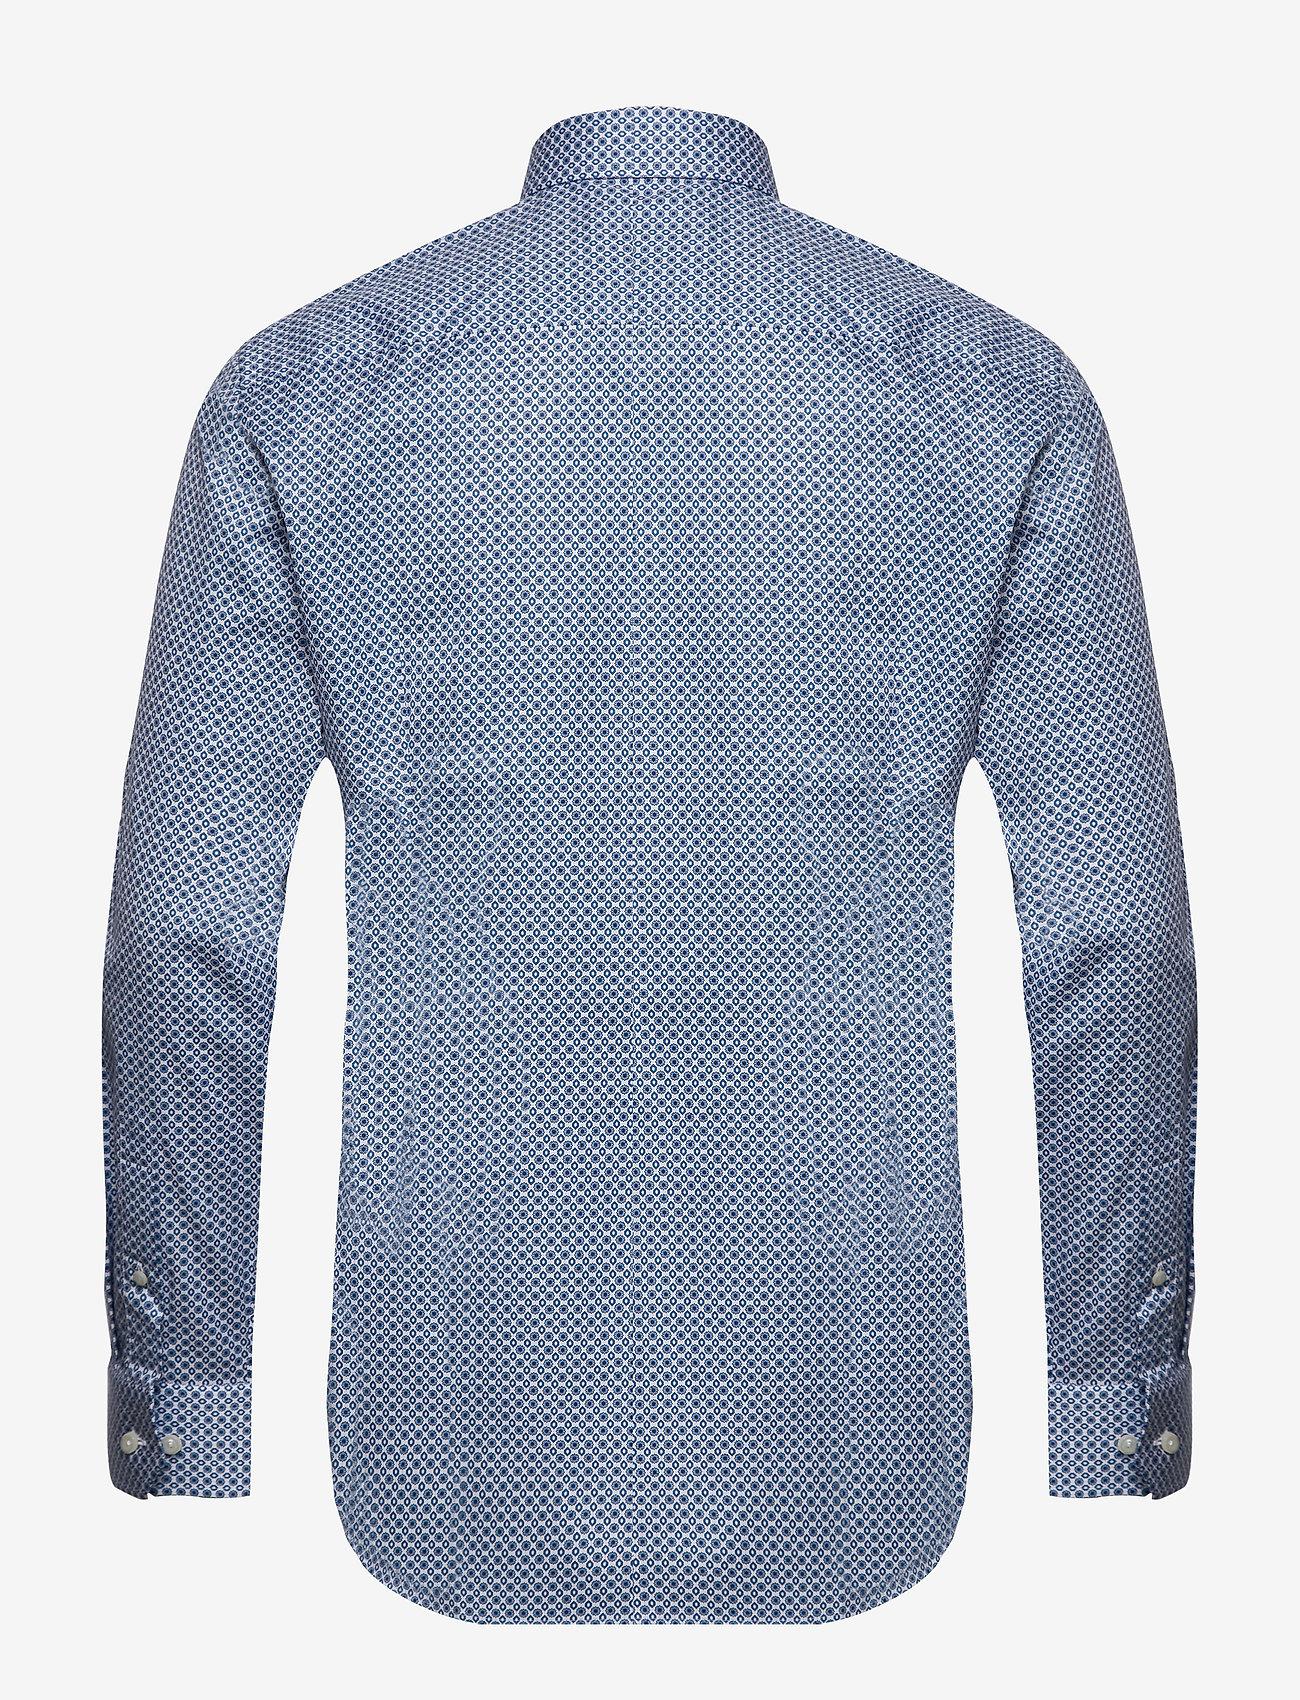 Eton Beige Medallions Print Shirt - Shirts